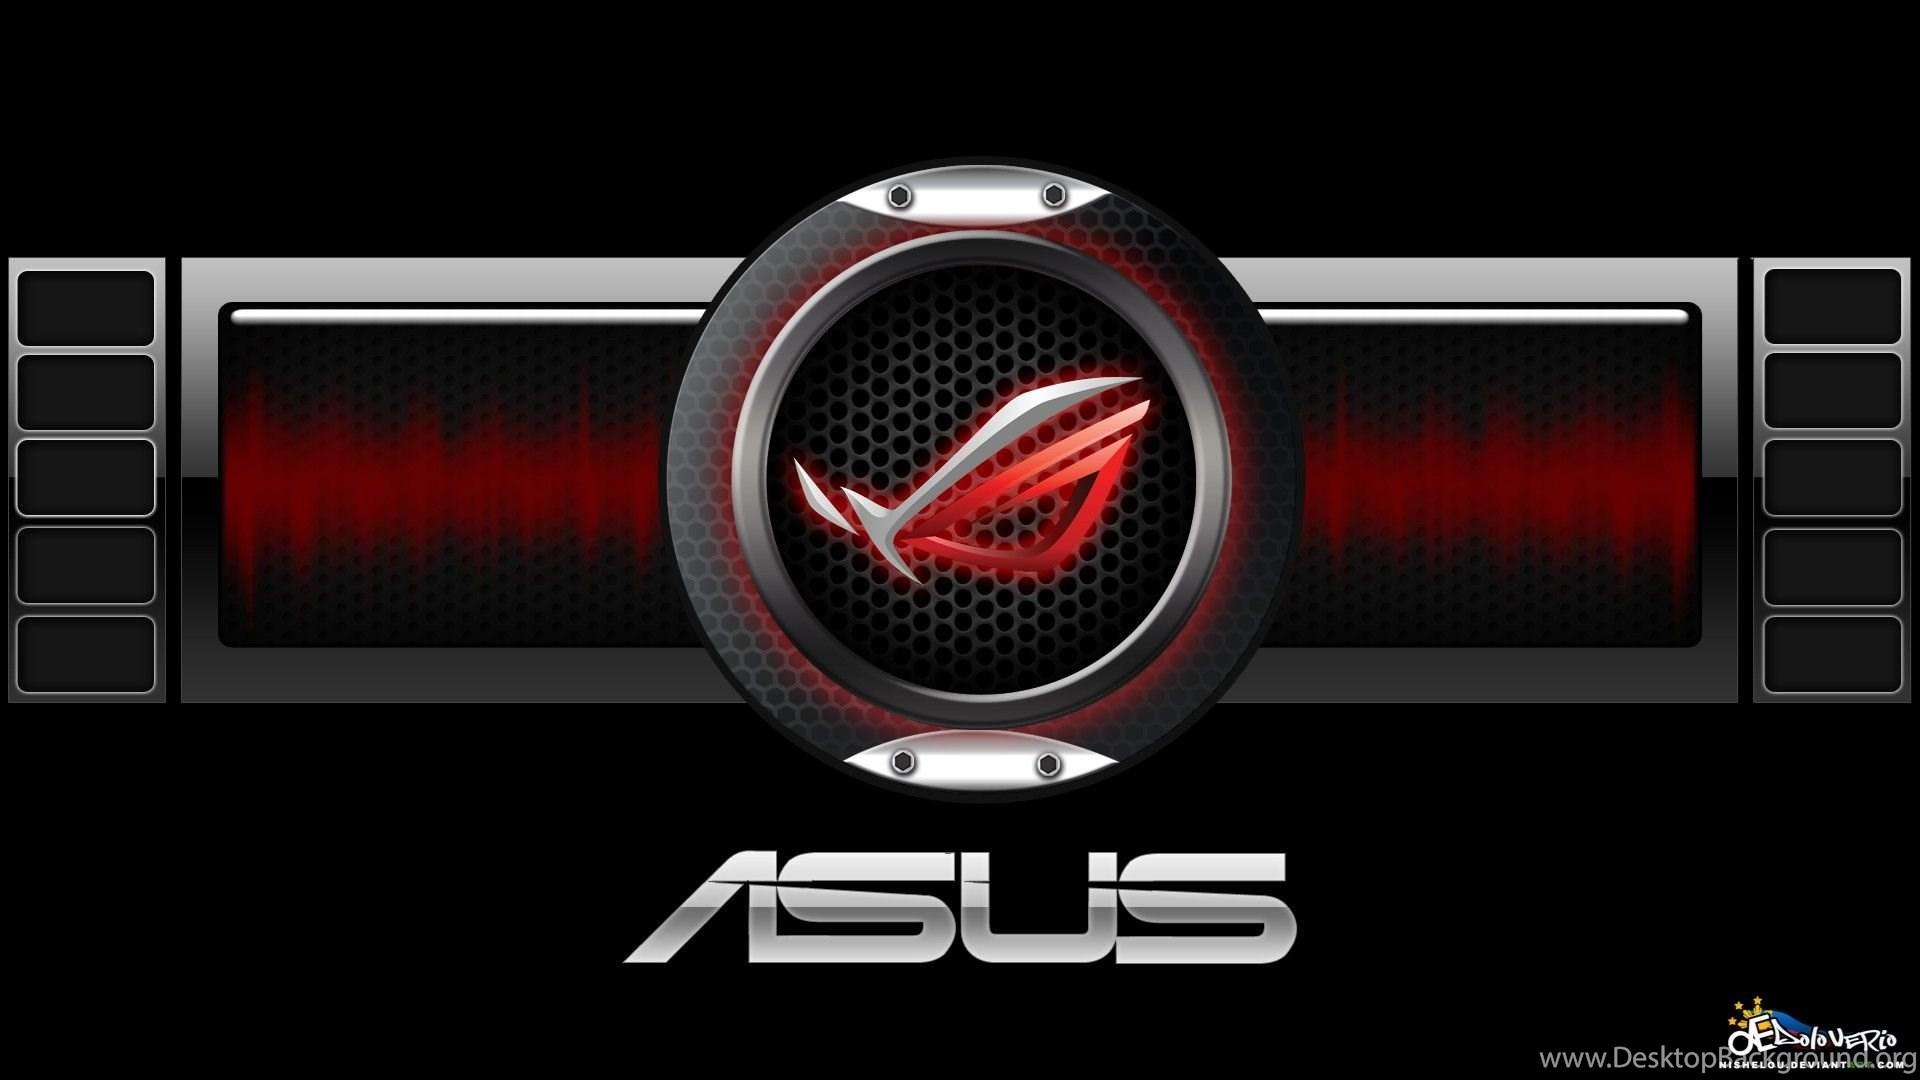 Asus Wallpapers 1080p Hd 569 Seo Wallpapers Desktop Background